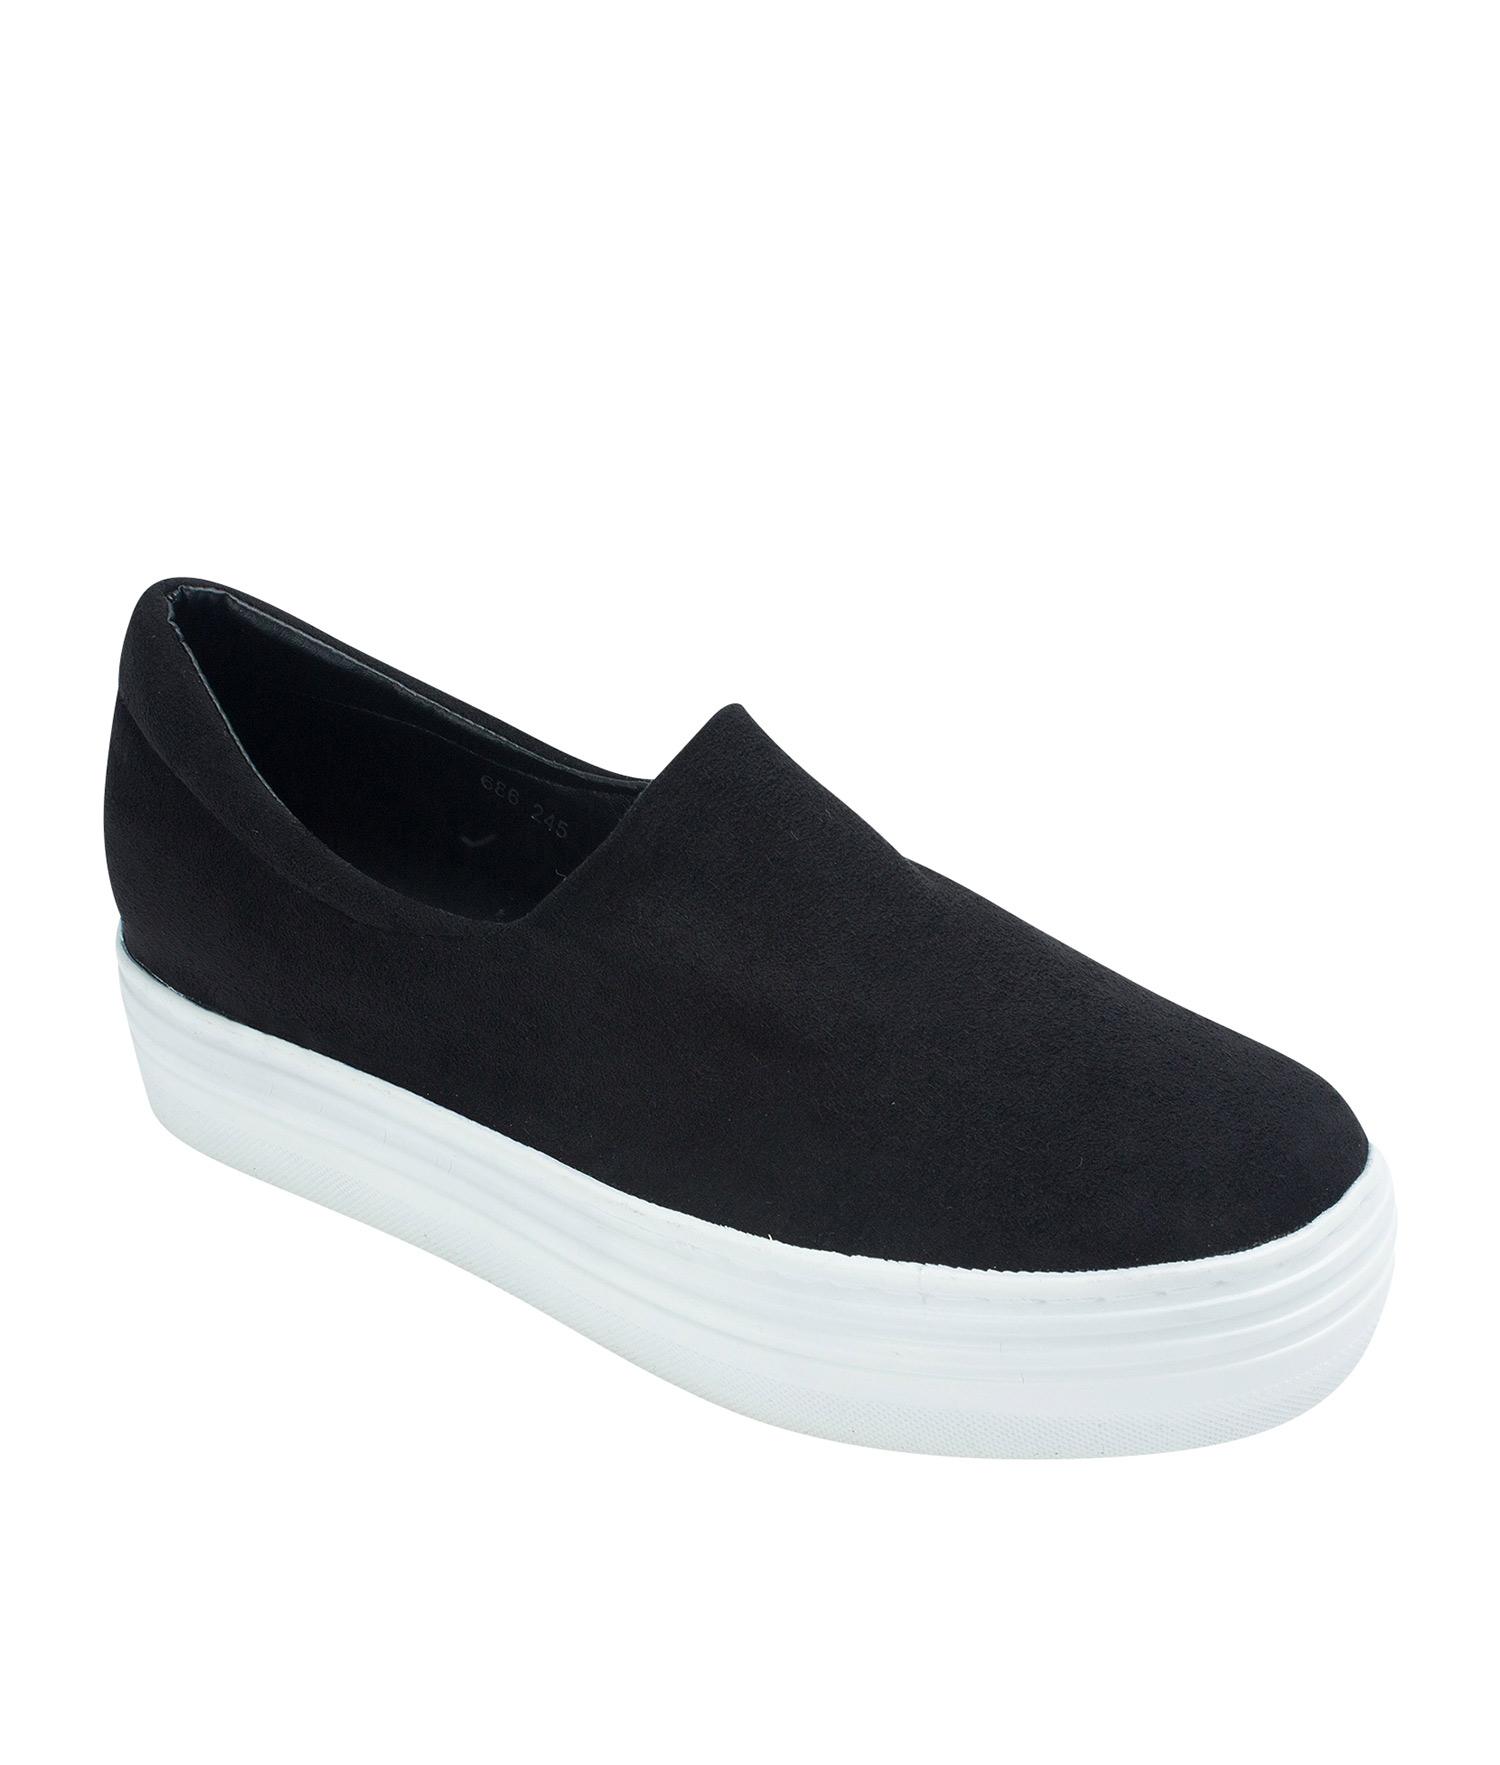 6e7e062cc5 AnnaKastle Womens Faux Suede Stretch Slip-On Platform Sneakers Black